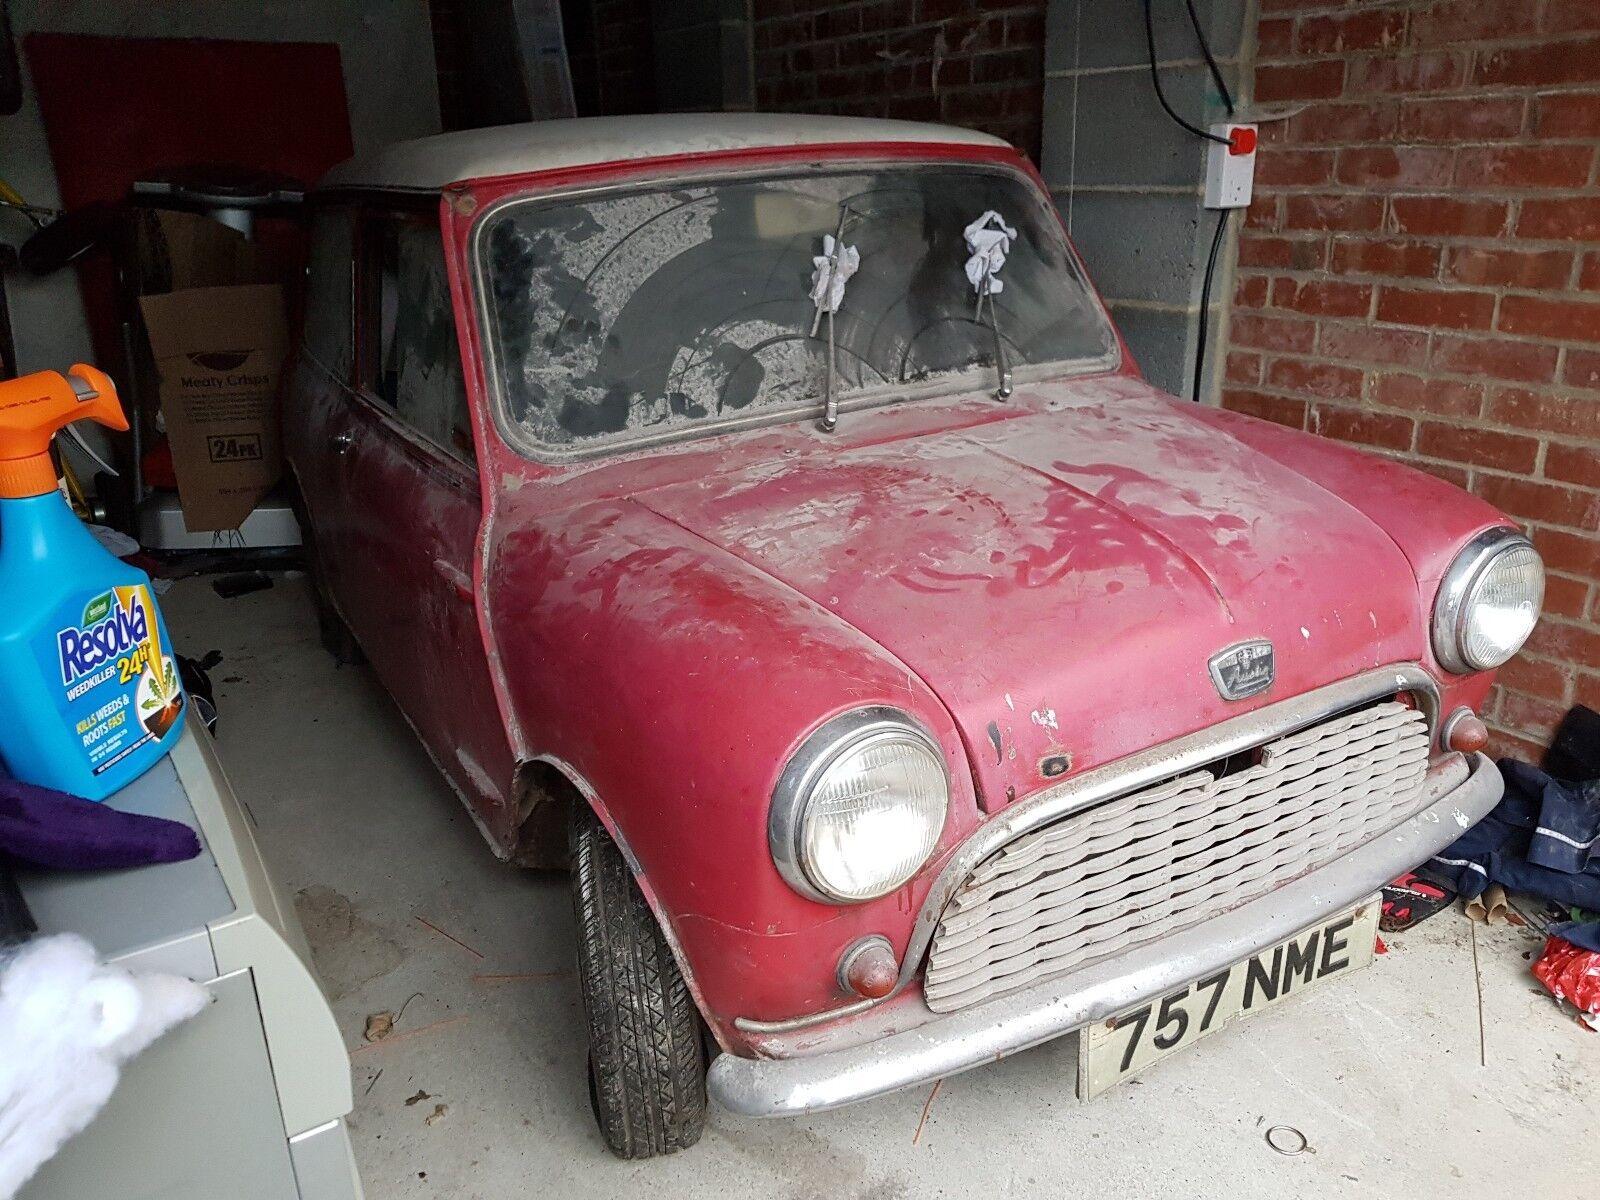 Cheap Classic Cars For Sale - 1961 AUSTIN 7 MINI, BARN FIND ...